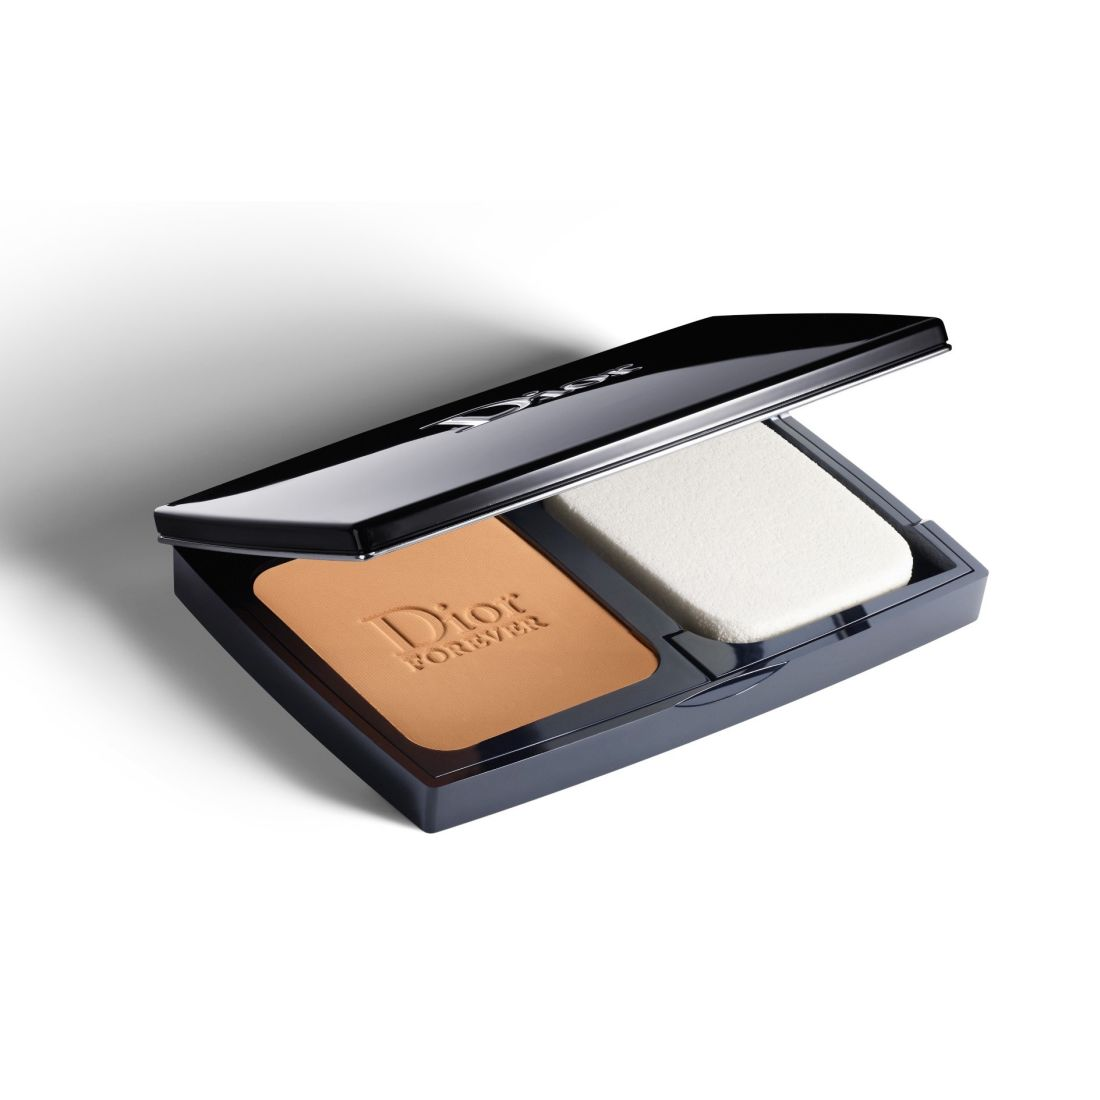 Christian Dior Diorskin Forever Extreme Control Foundation Powder 9.9gr 040 Honey Beige